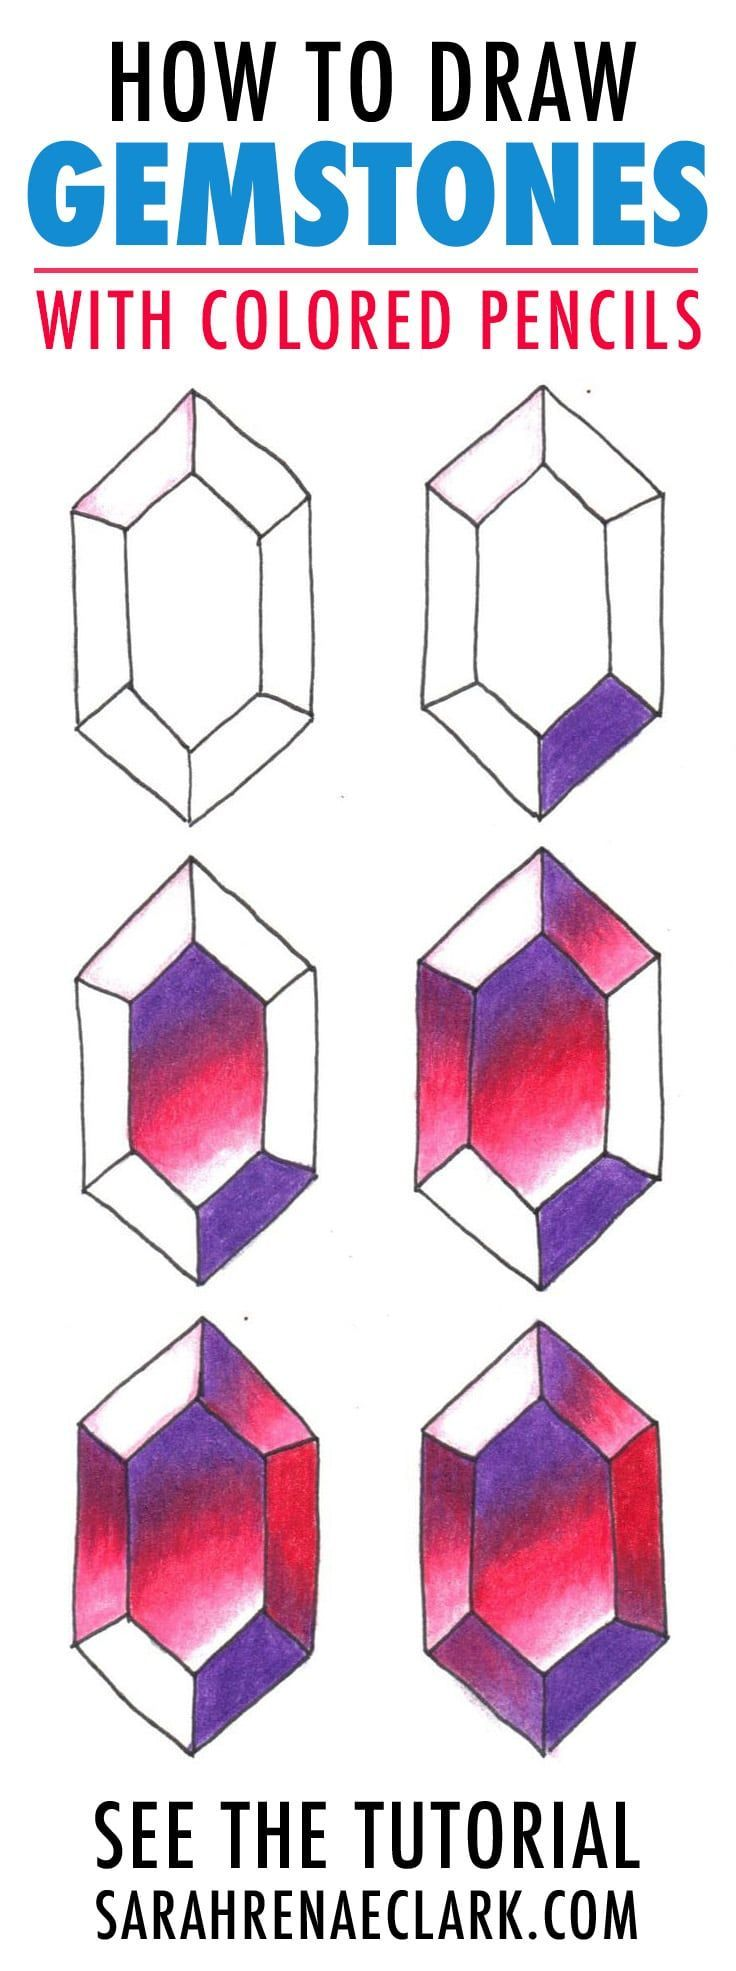 #sarahrenaeclarkcom #adultcoloring #coloringbook #gemstones #technique #tutorial #produces #coloring...